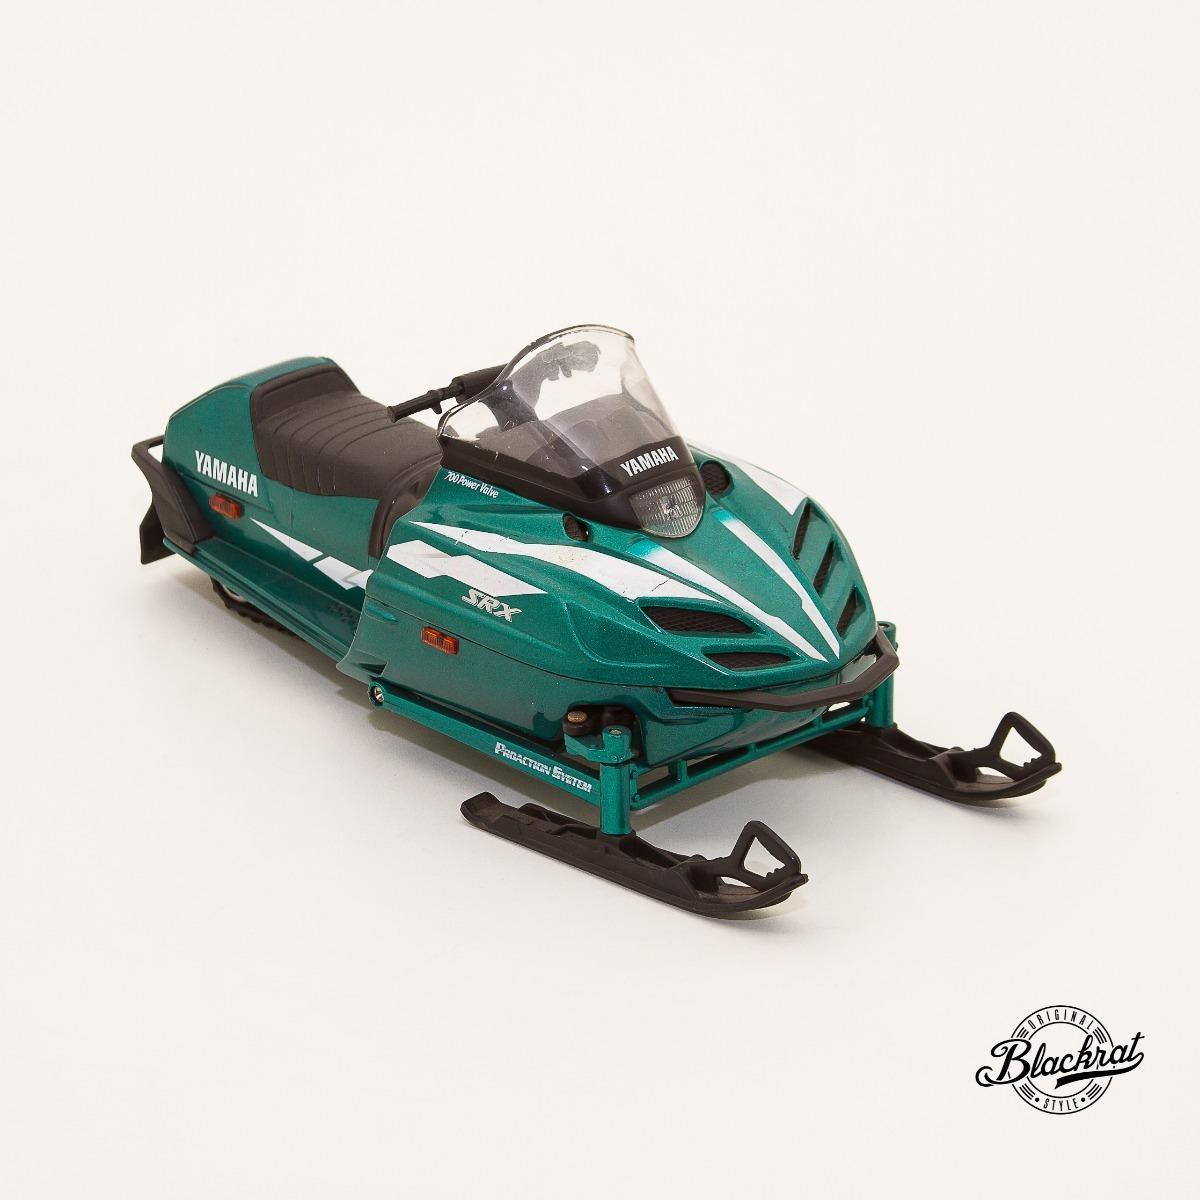 Miniatura New-ray Yamaha Snowmobile Mountain Srx 700 - 1999